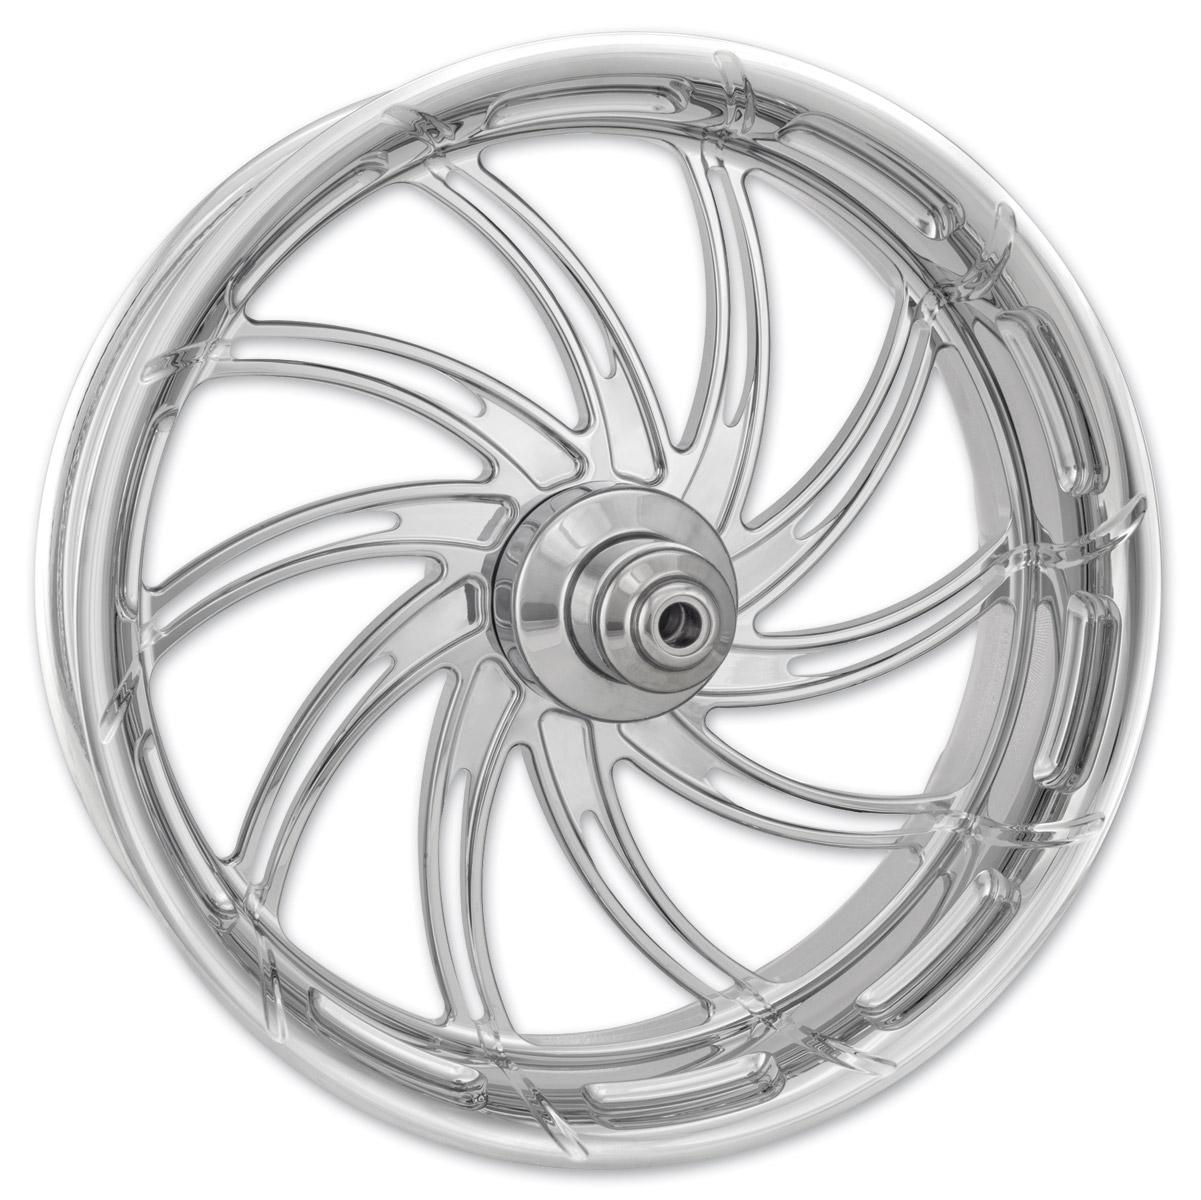 Performance Machine Supra Chrome Front Wheel, 23″ x 3.5″